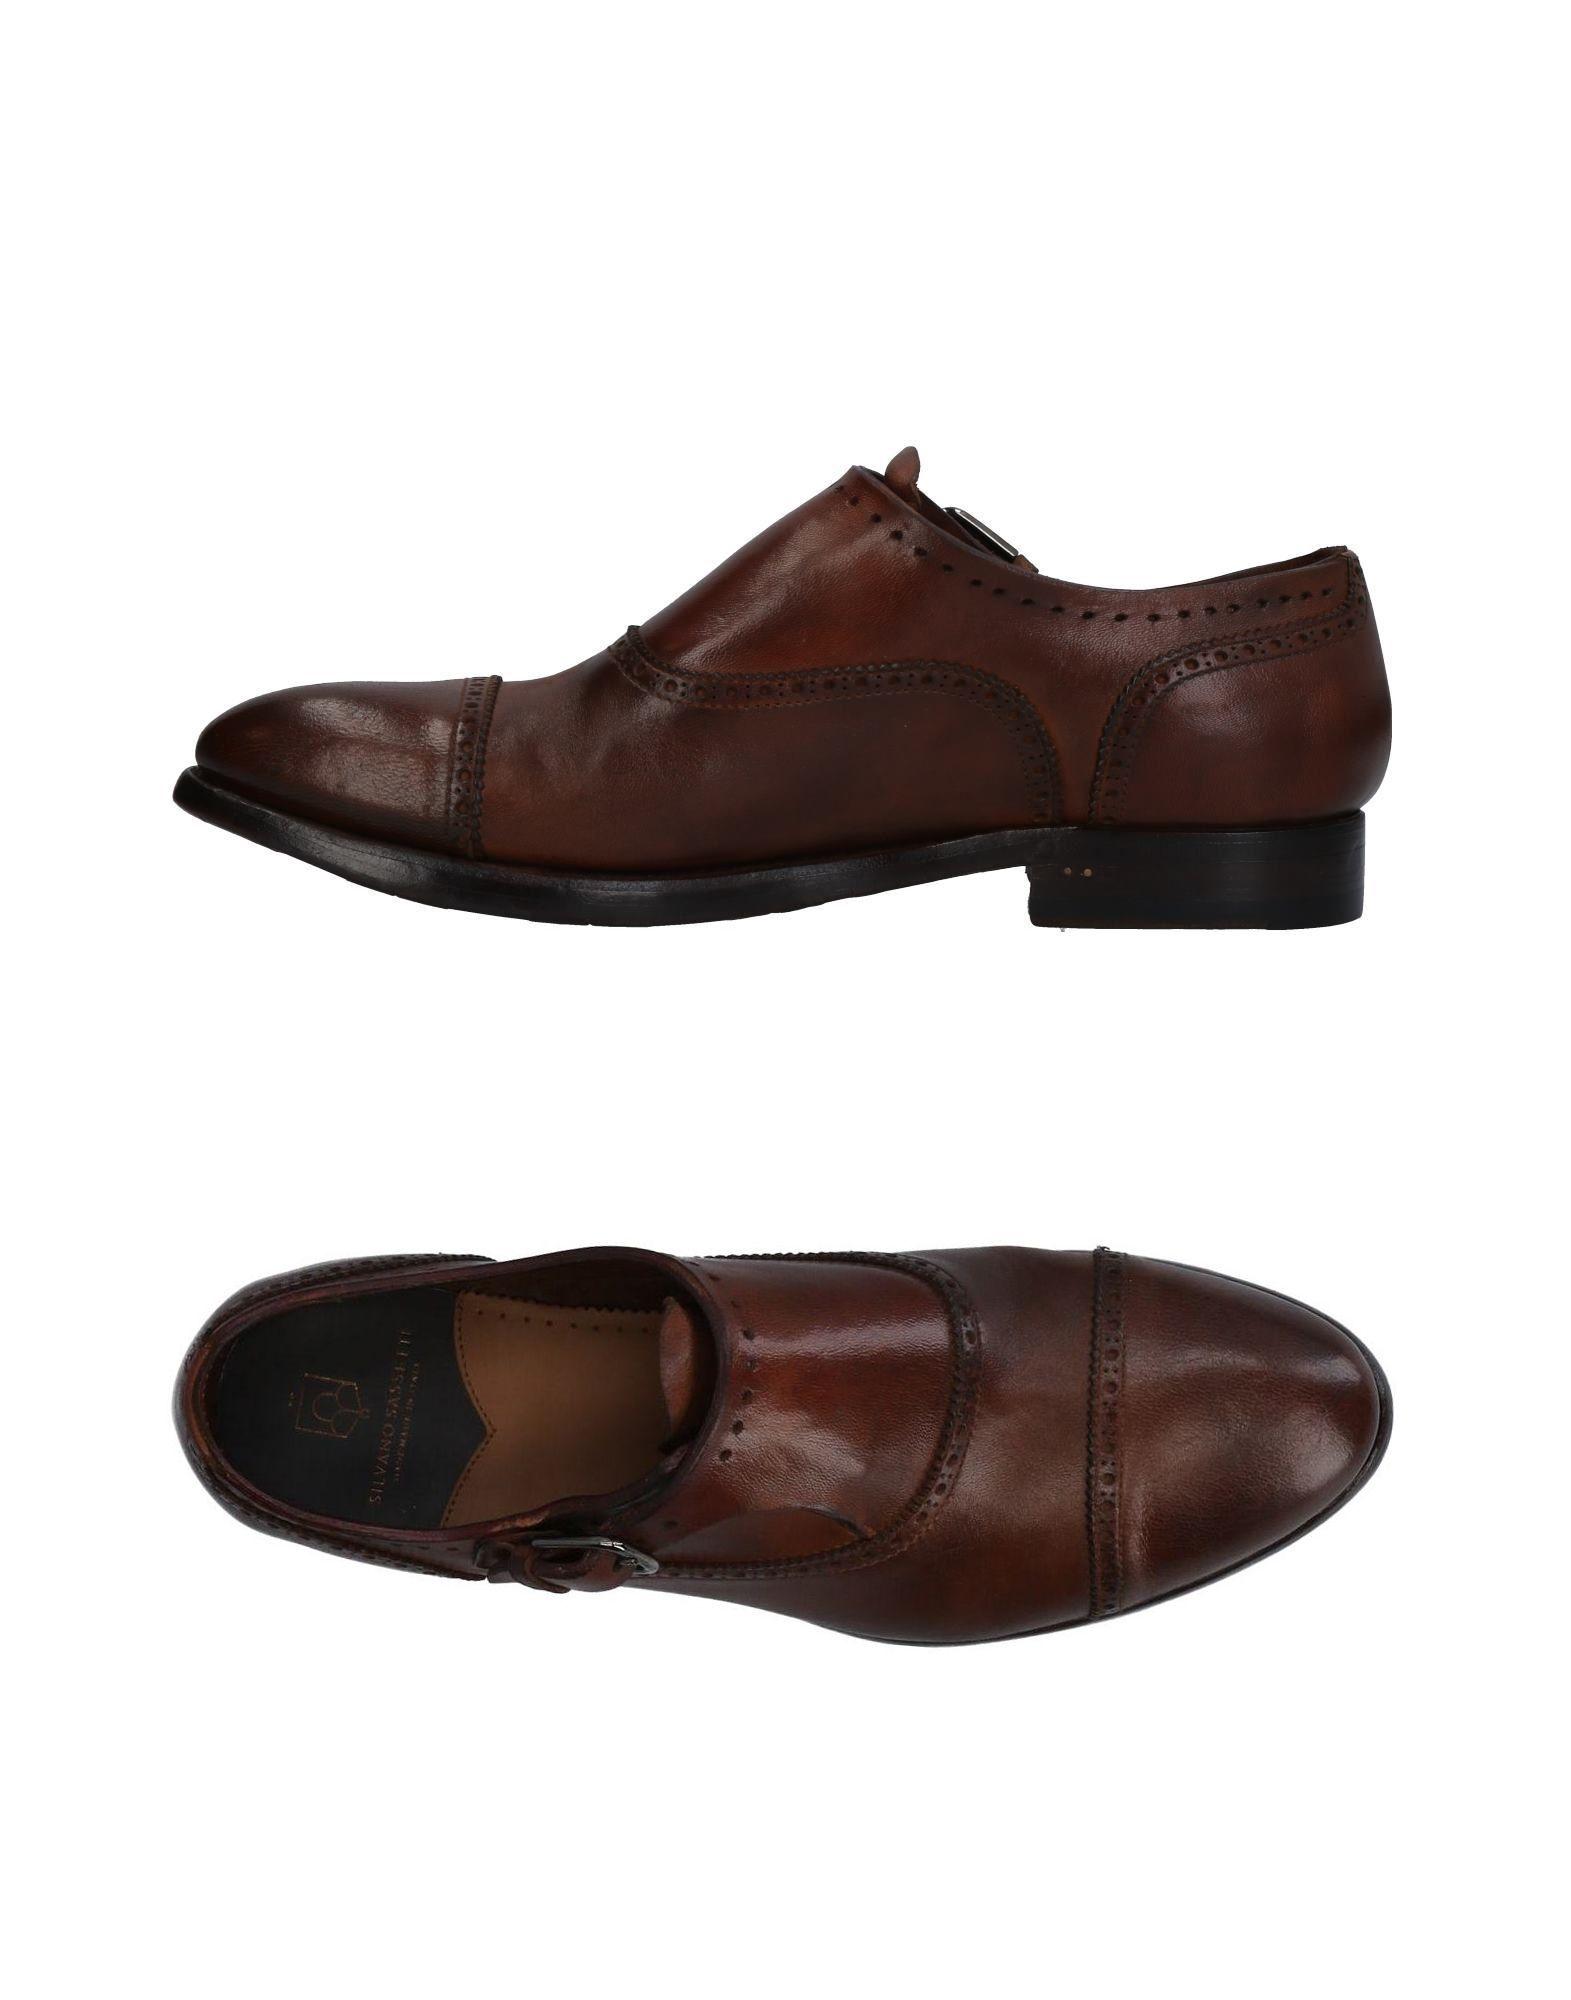 Silvano Sassetti Mokassins Herren  11457324SF Gute Qualität beliebte Schuhe